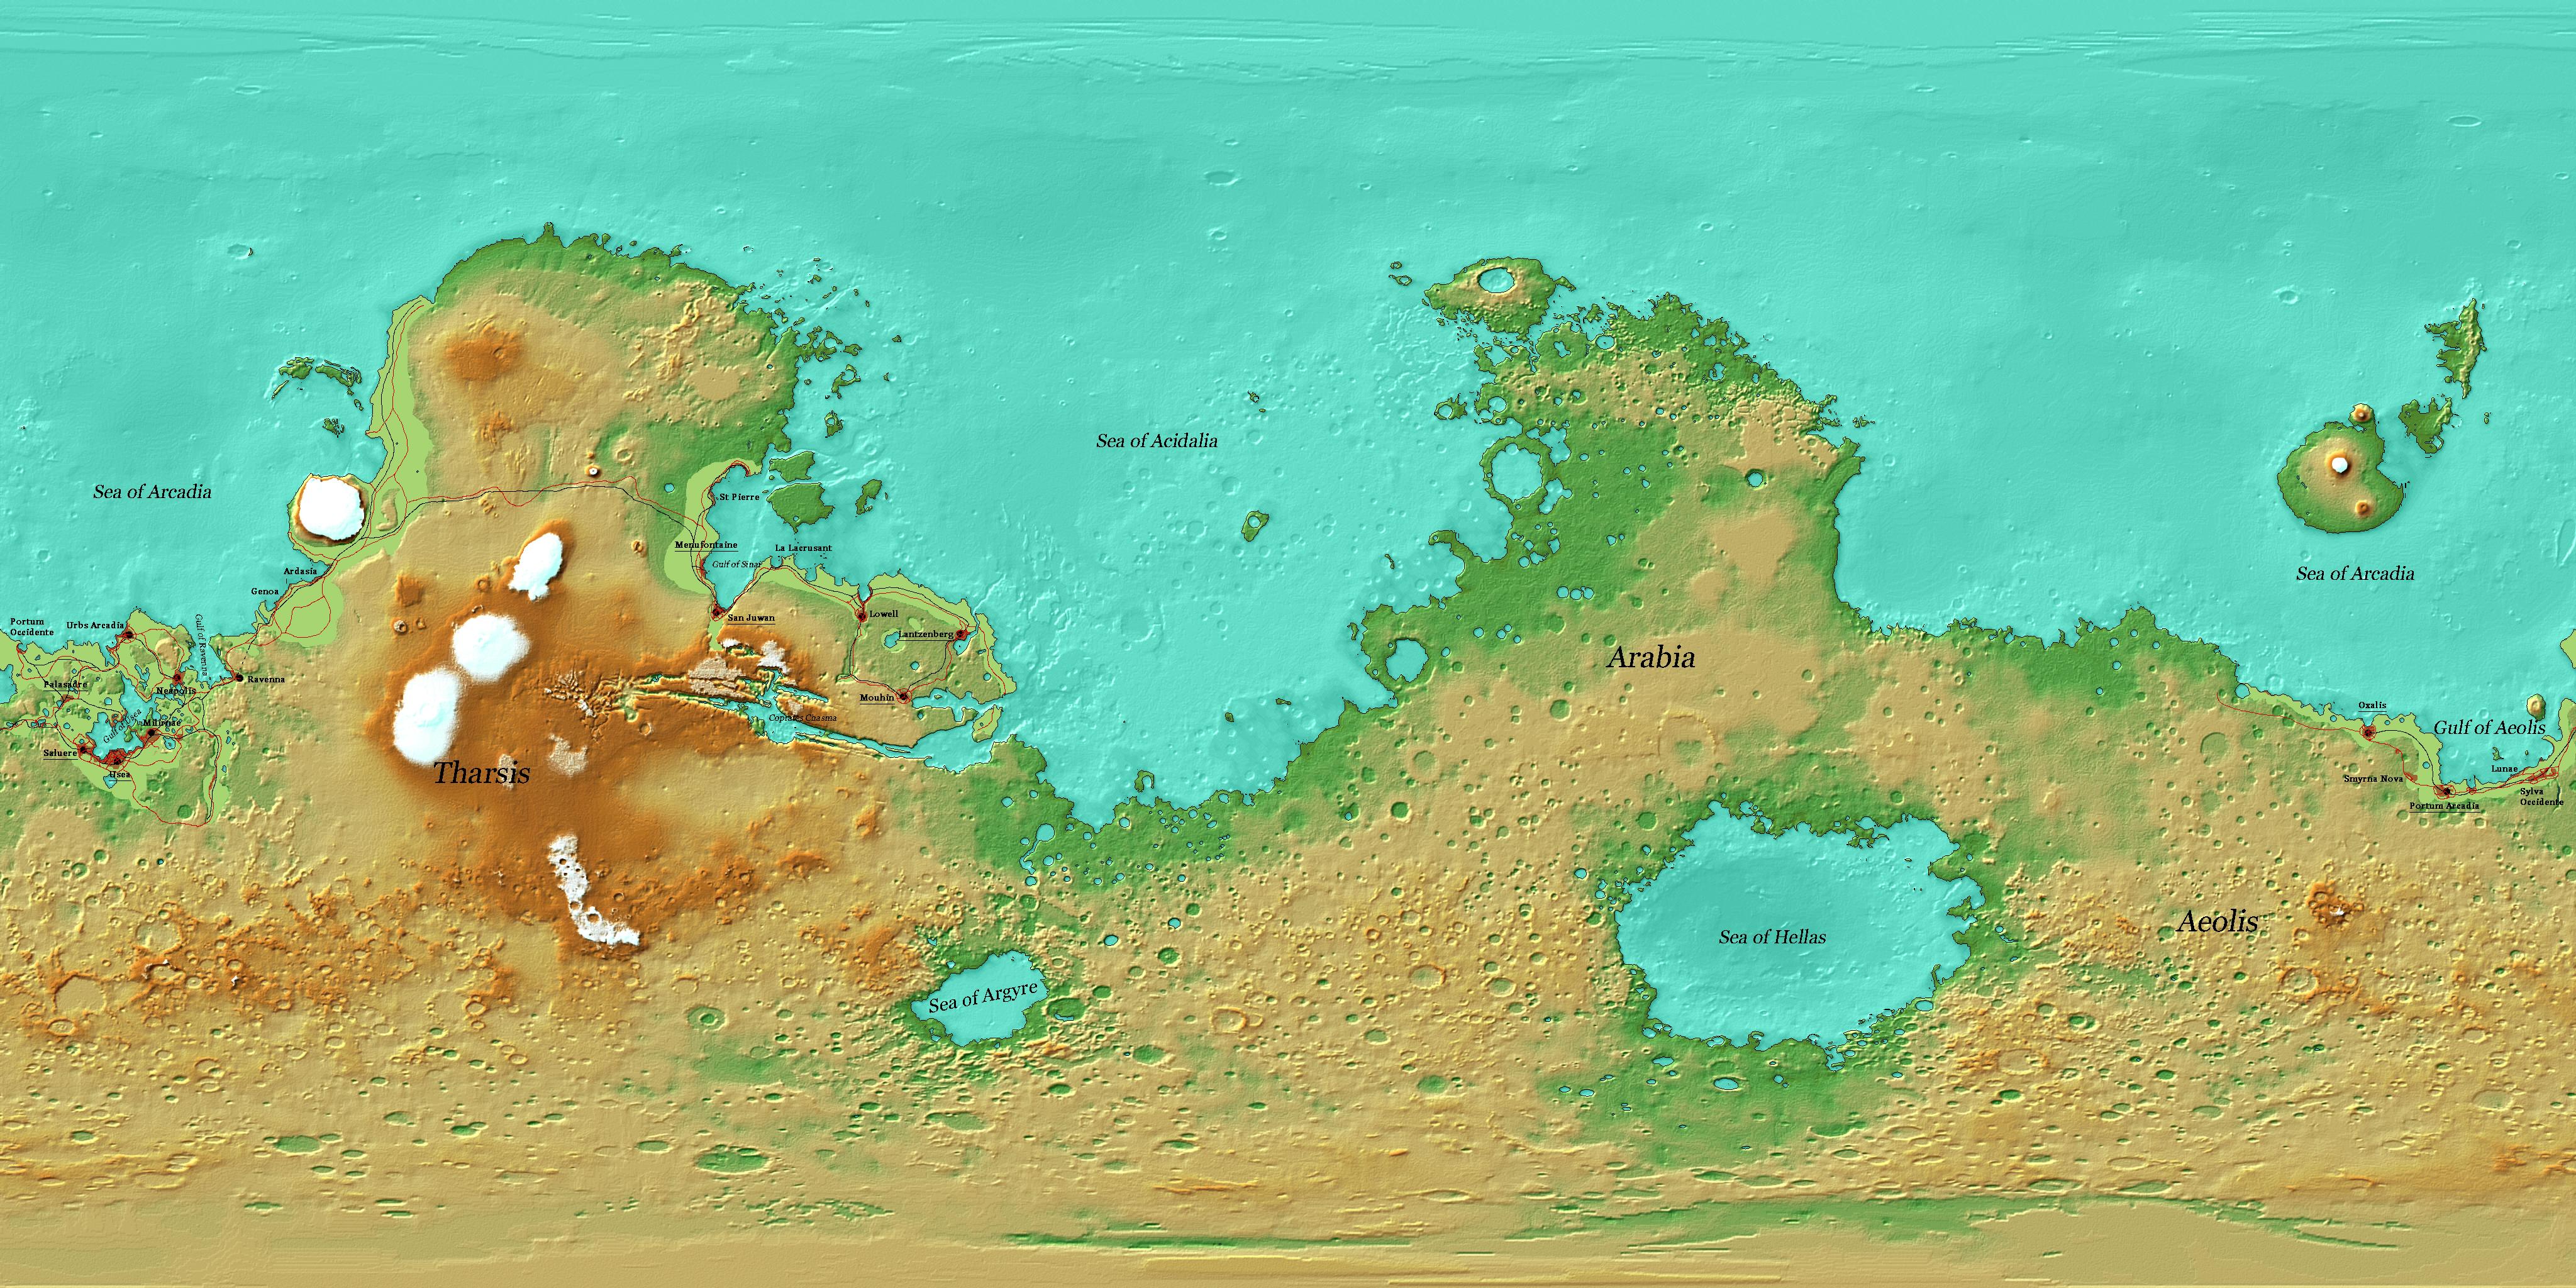 Mars Political Map by AxiaTerraArtUnion on DeviantArt on borealis basin on mars, detailed map of mars, map of a trip to mars, political map of mars, map of mars space, map of mars land, modern map of mars, map of mars with water, terraforming of mars,